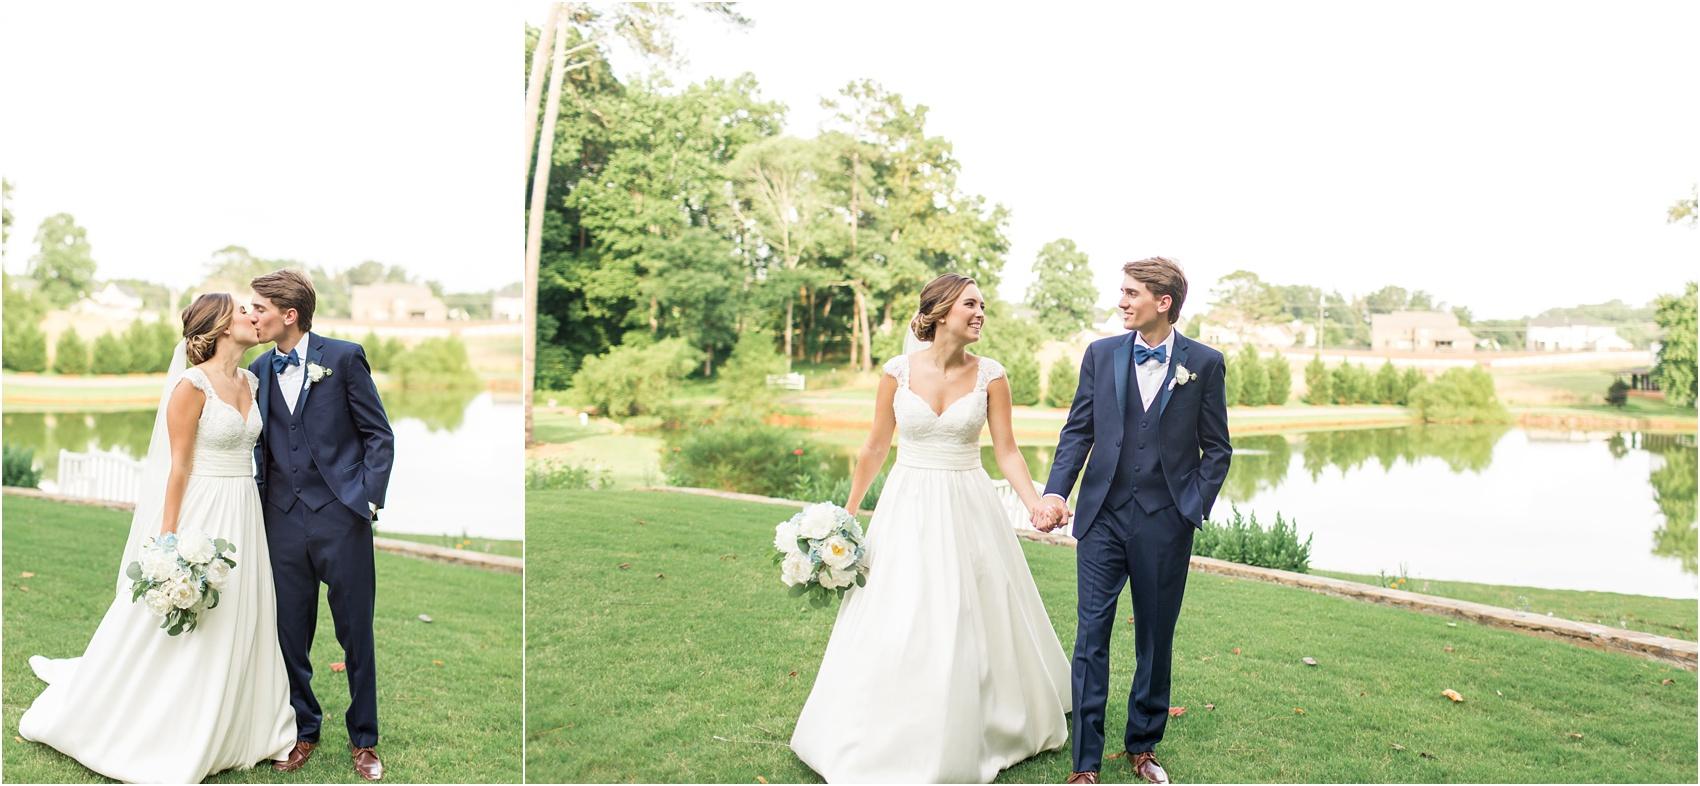 Savannah Eve Photography- Sigl-Adams Wedding- Sneak Peek-63.jpg